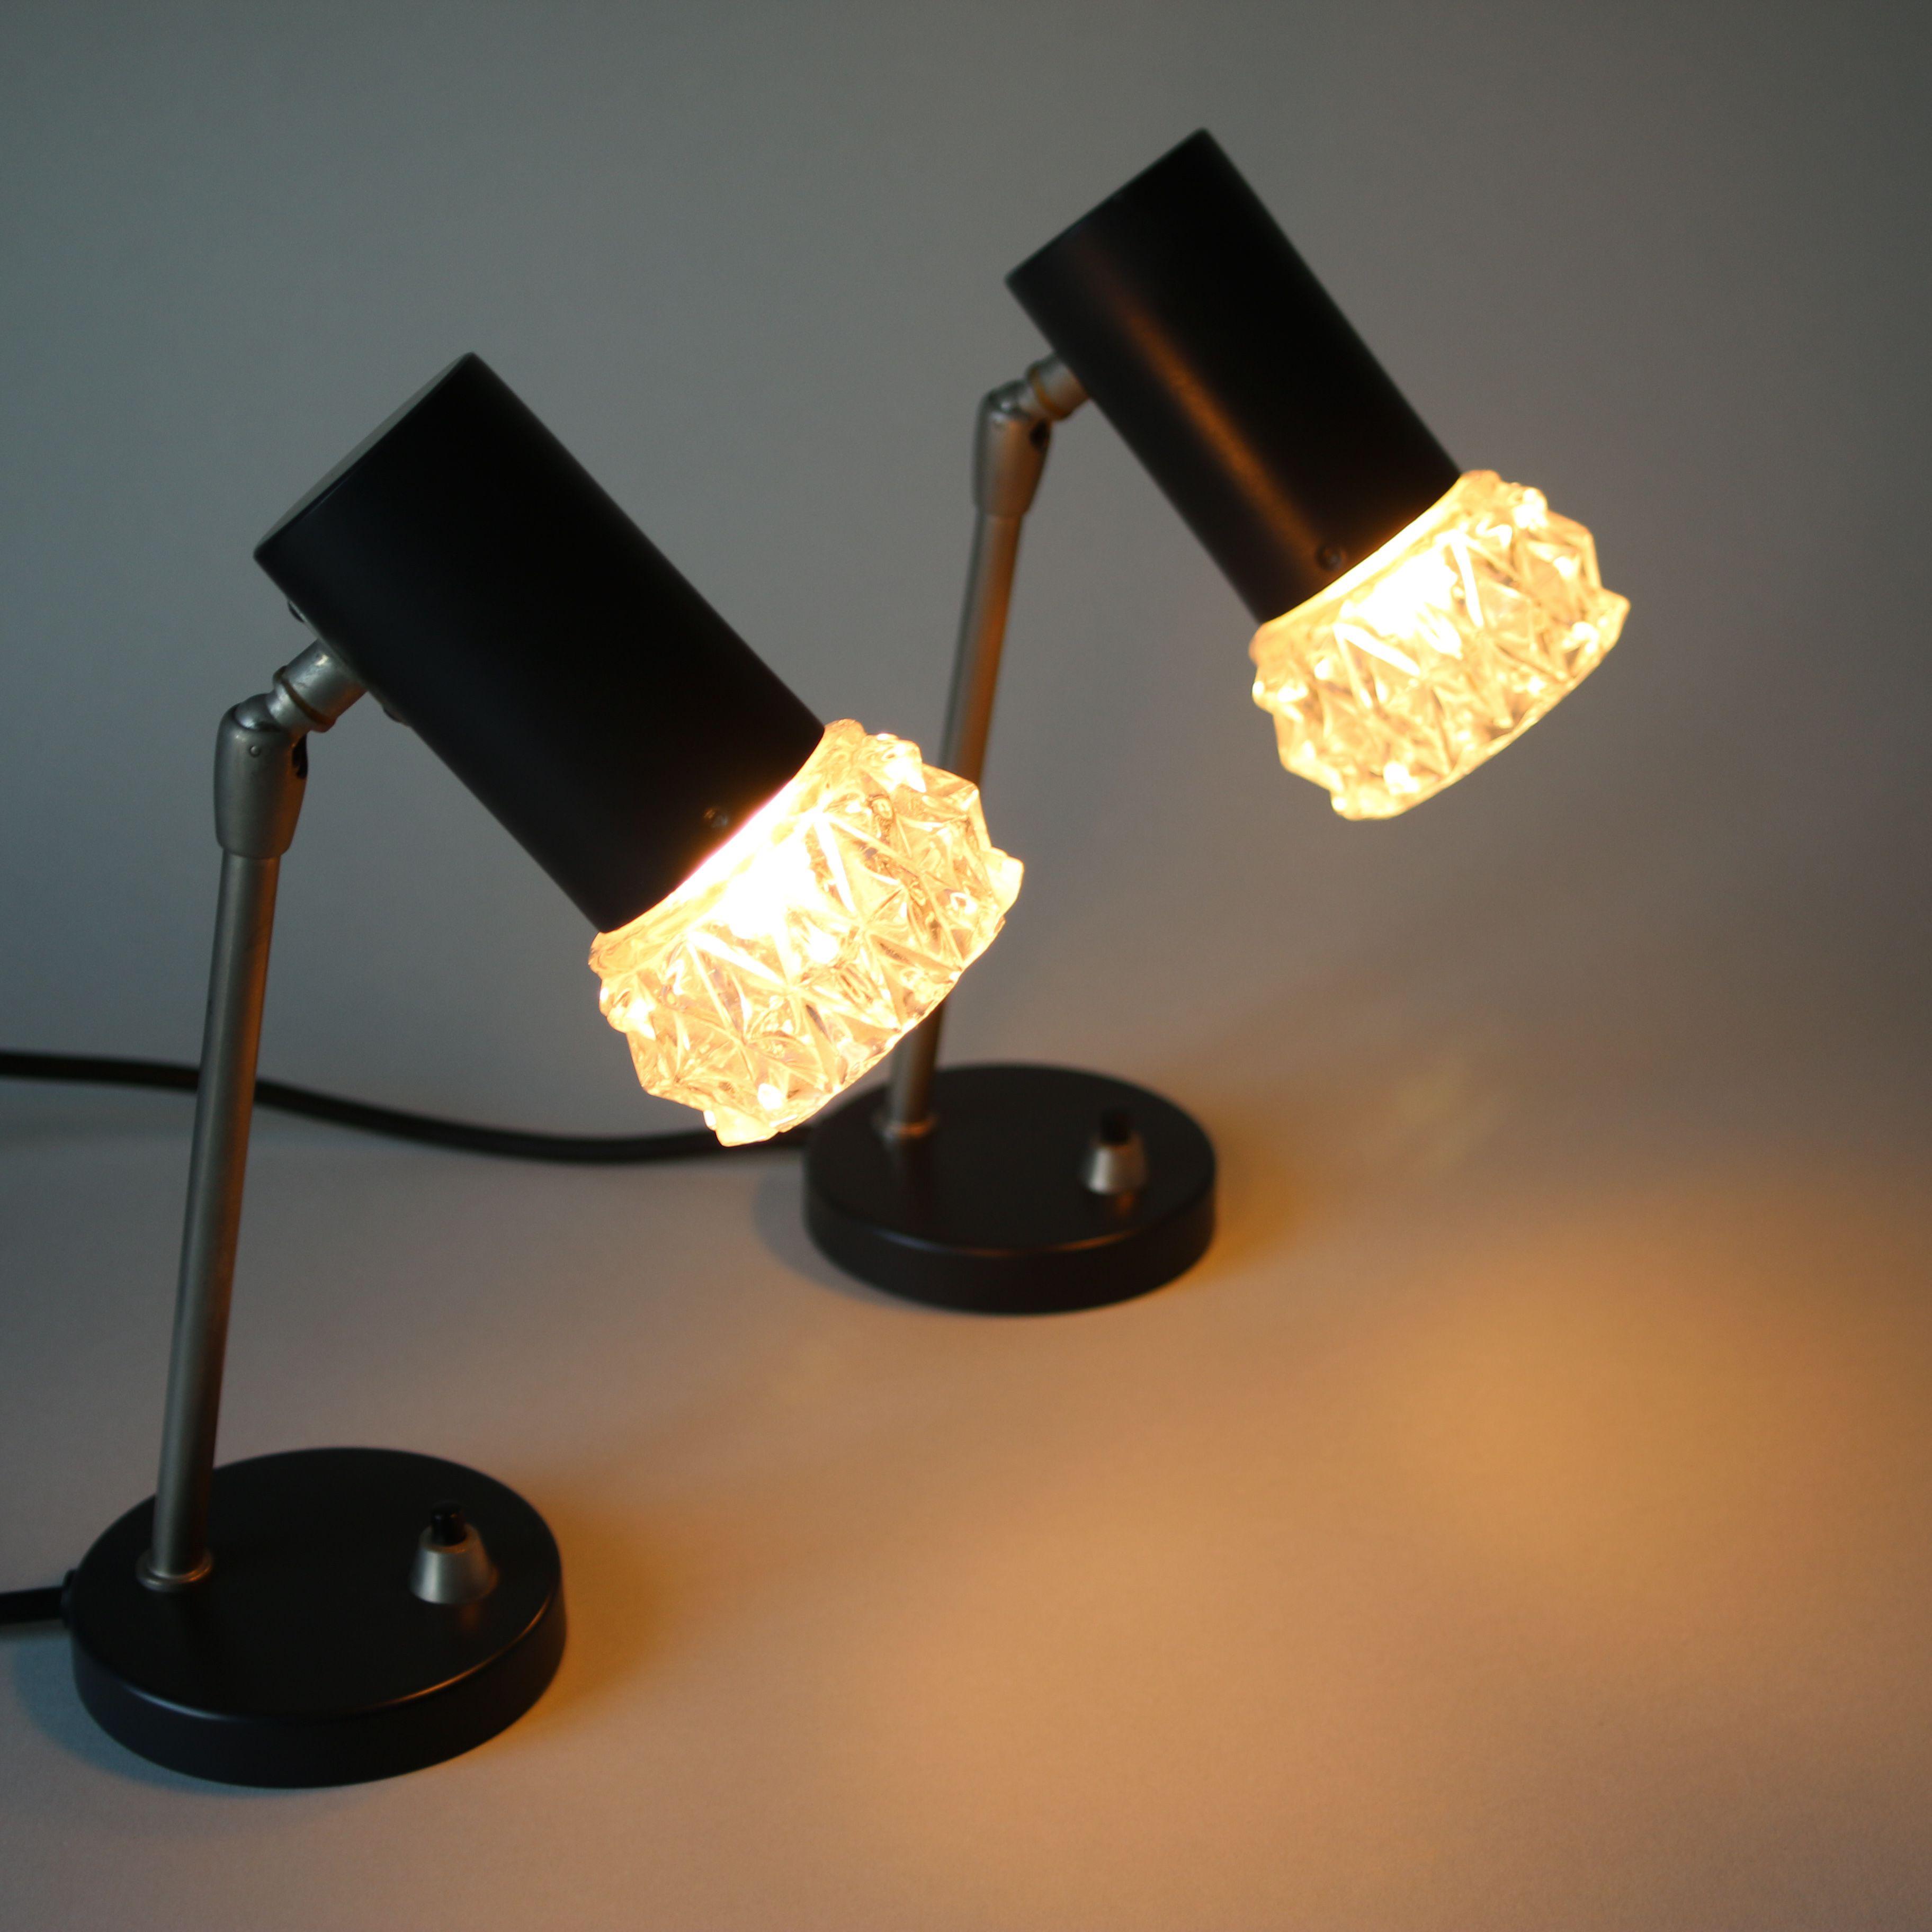 Vintage Lamp White Desk Lamps Ddr Design Veb Narva 70s Etsy Modern Lamp Metal Lamp Lamp